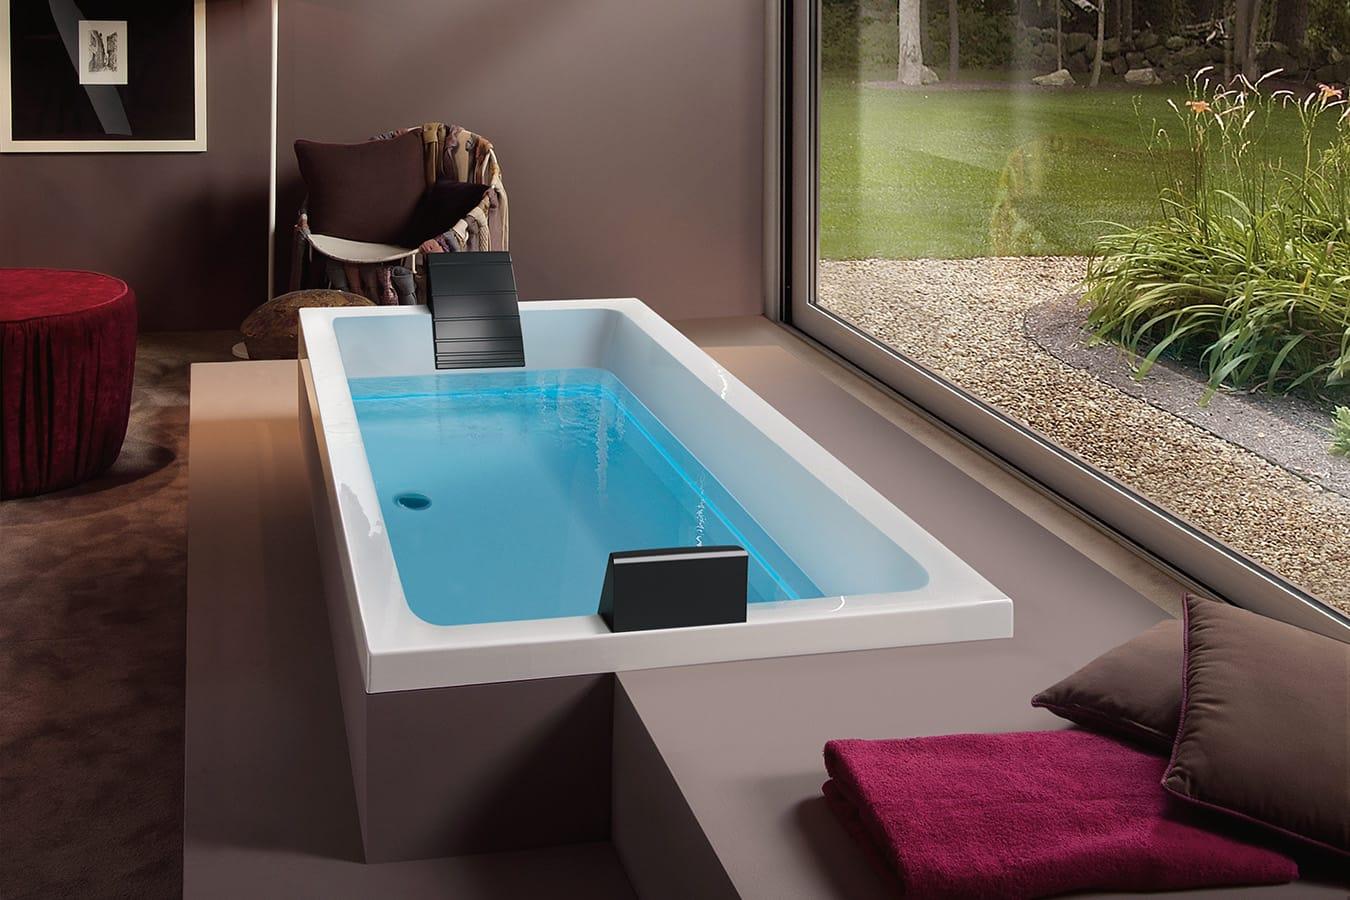 Hot Tub And Whirlpool Display Swindon Bascs Swindon